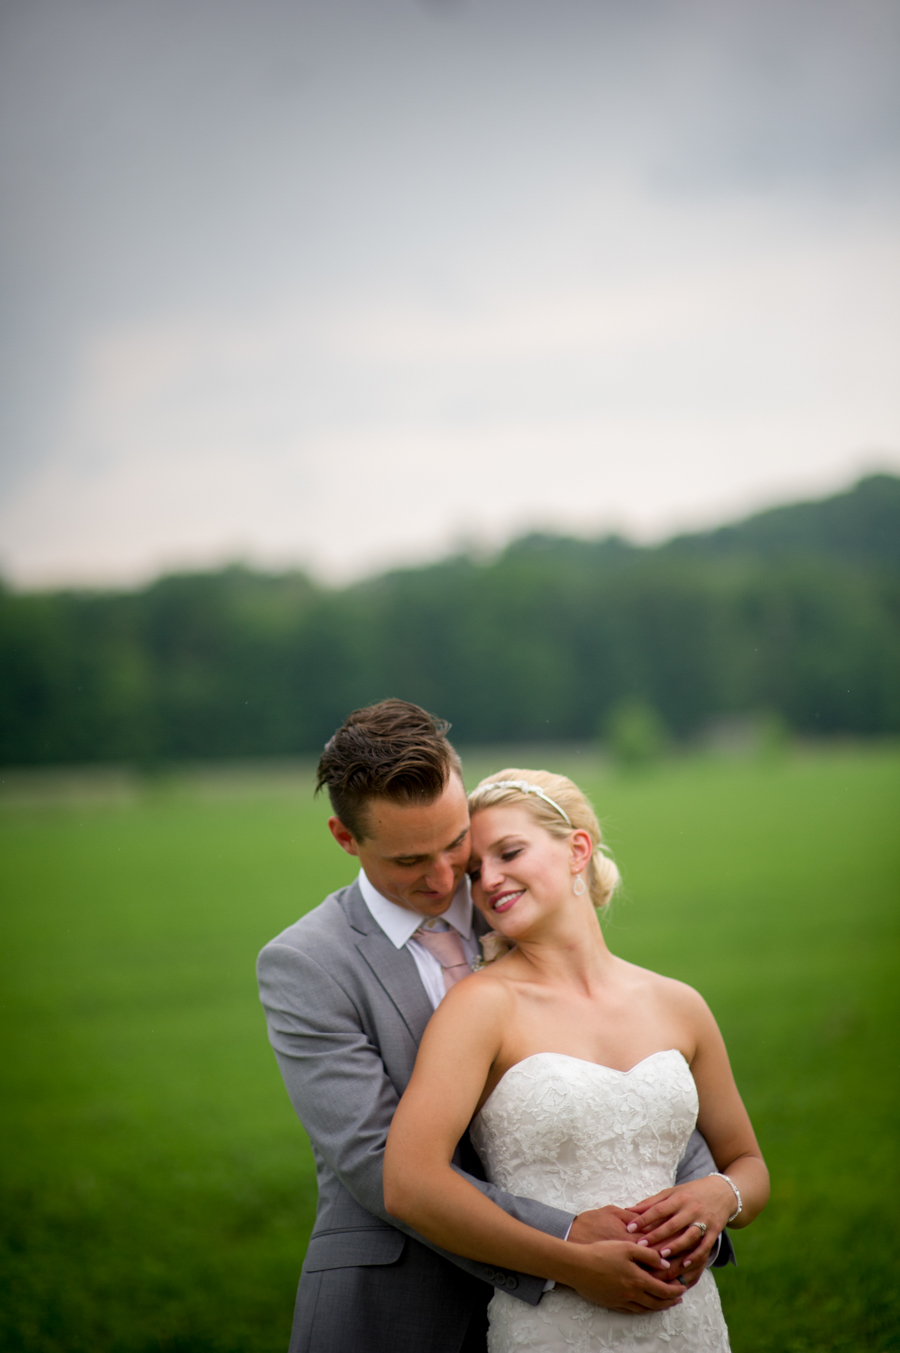 Herman-Luthers-Wedding-Photographer